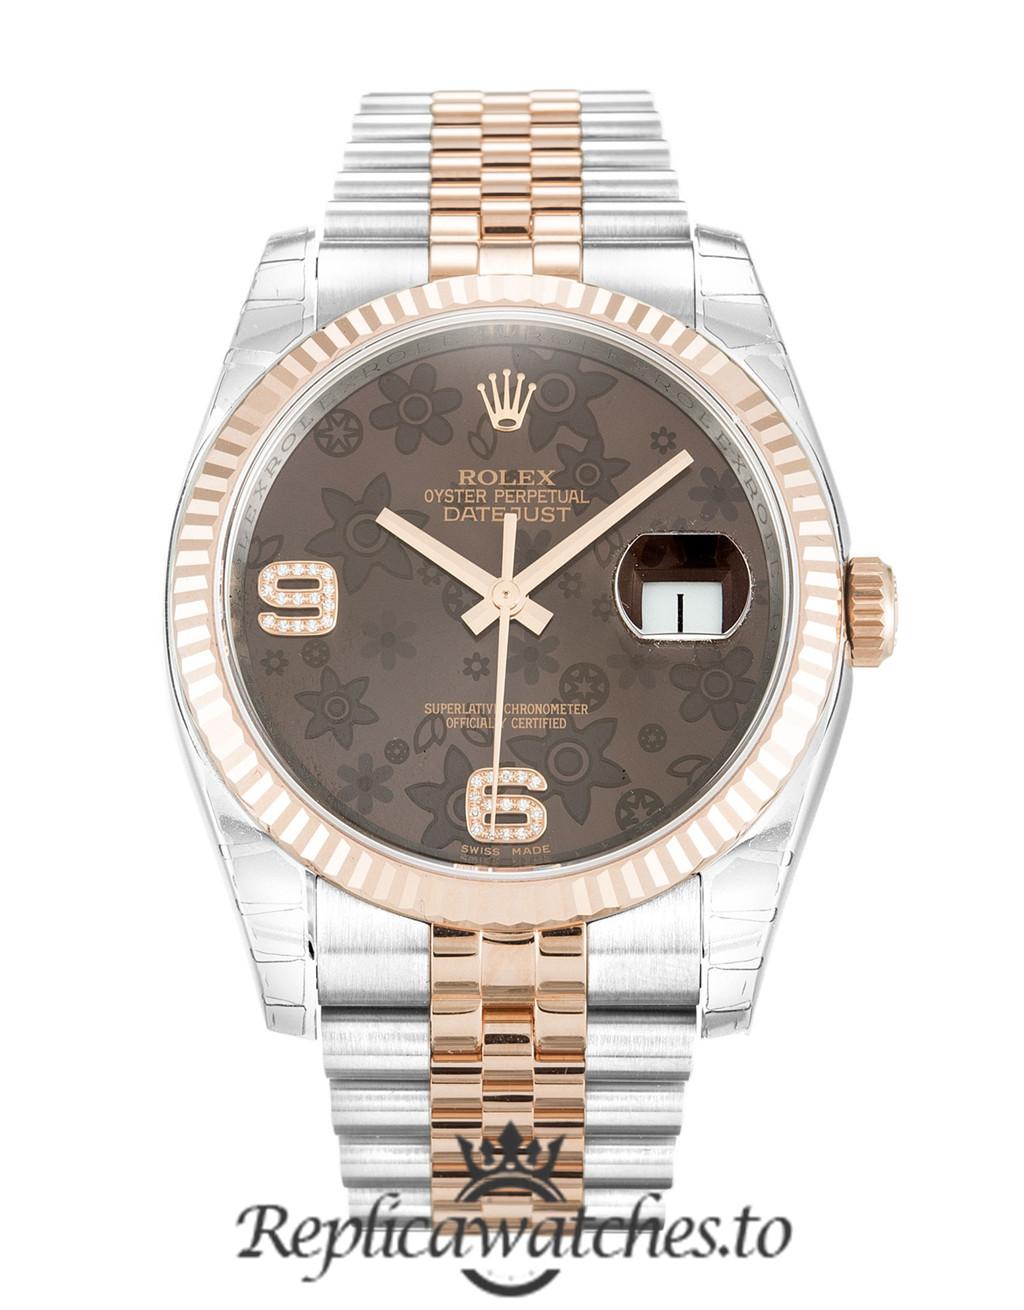 Rolex Datejust Replica 116231 003 Rose Gold Bezel 36MM